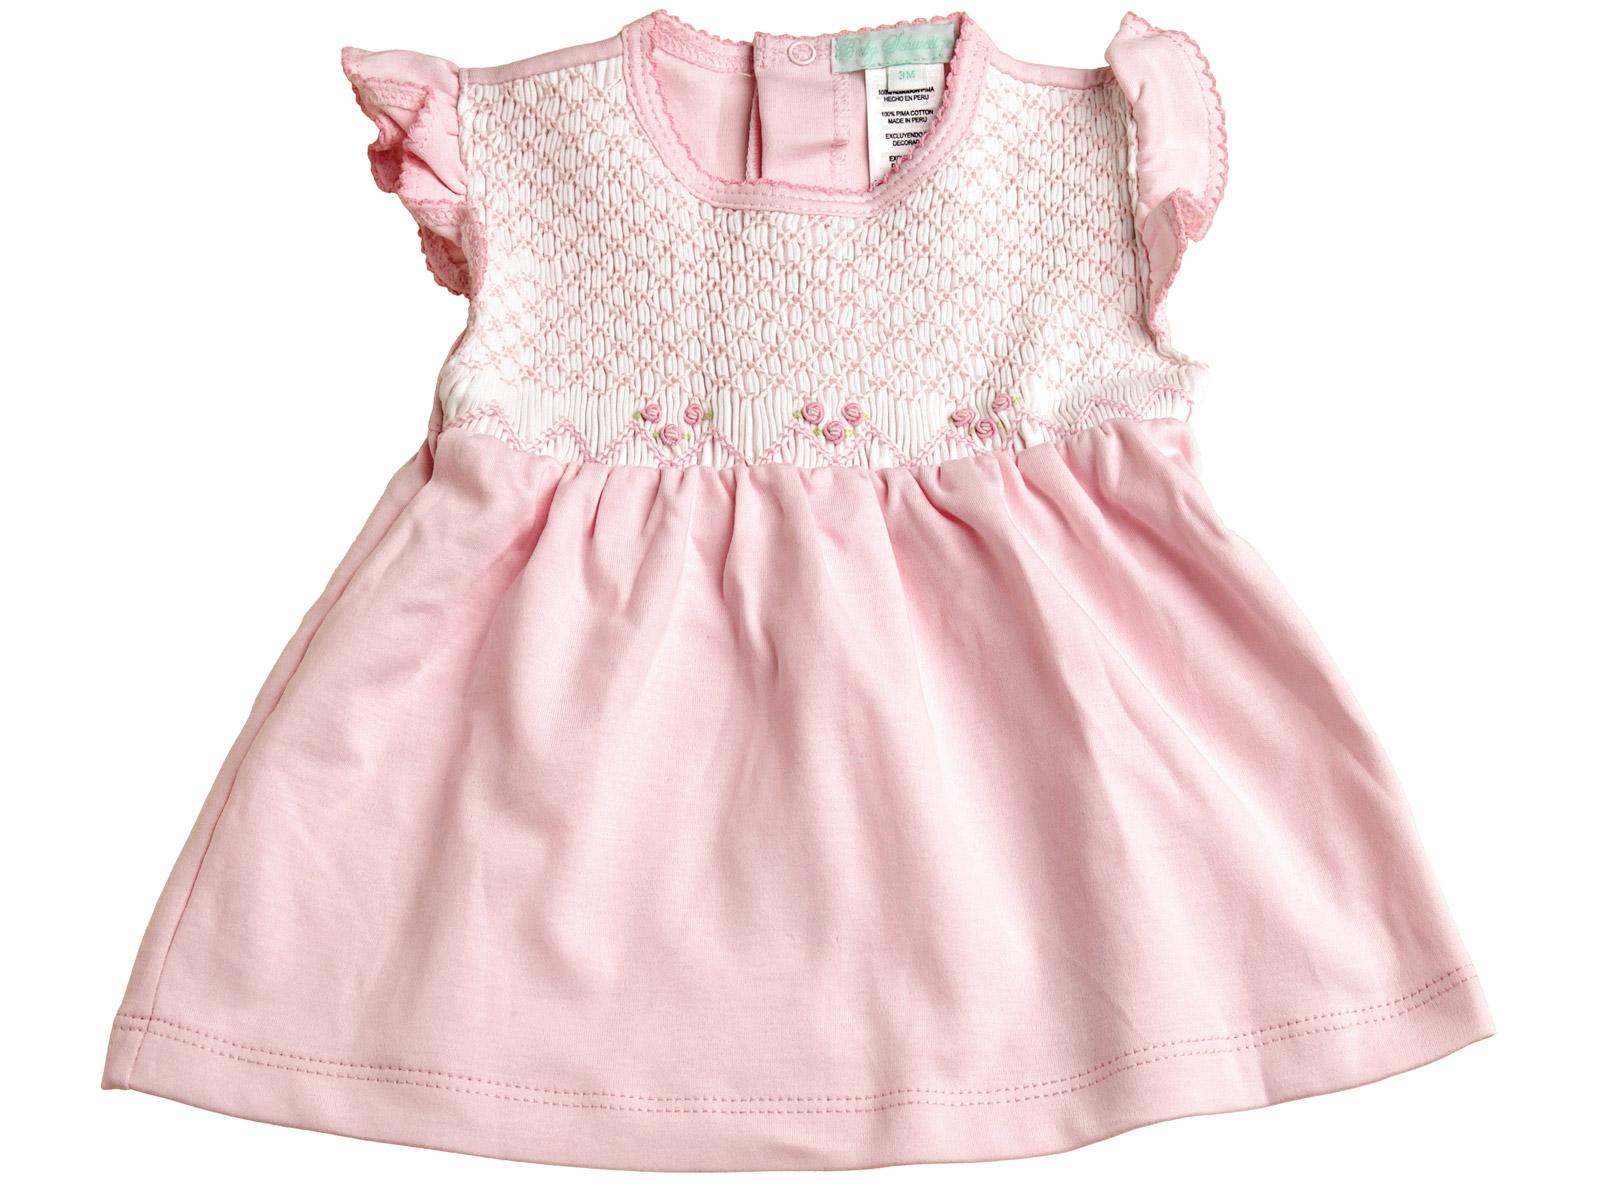 d7882a97b92a Lilian - Smocked Placket Dress   Bloomers - Baby - Schweitzer Linen